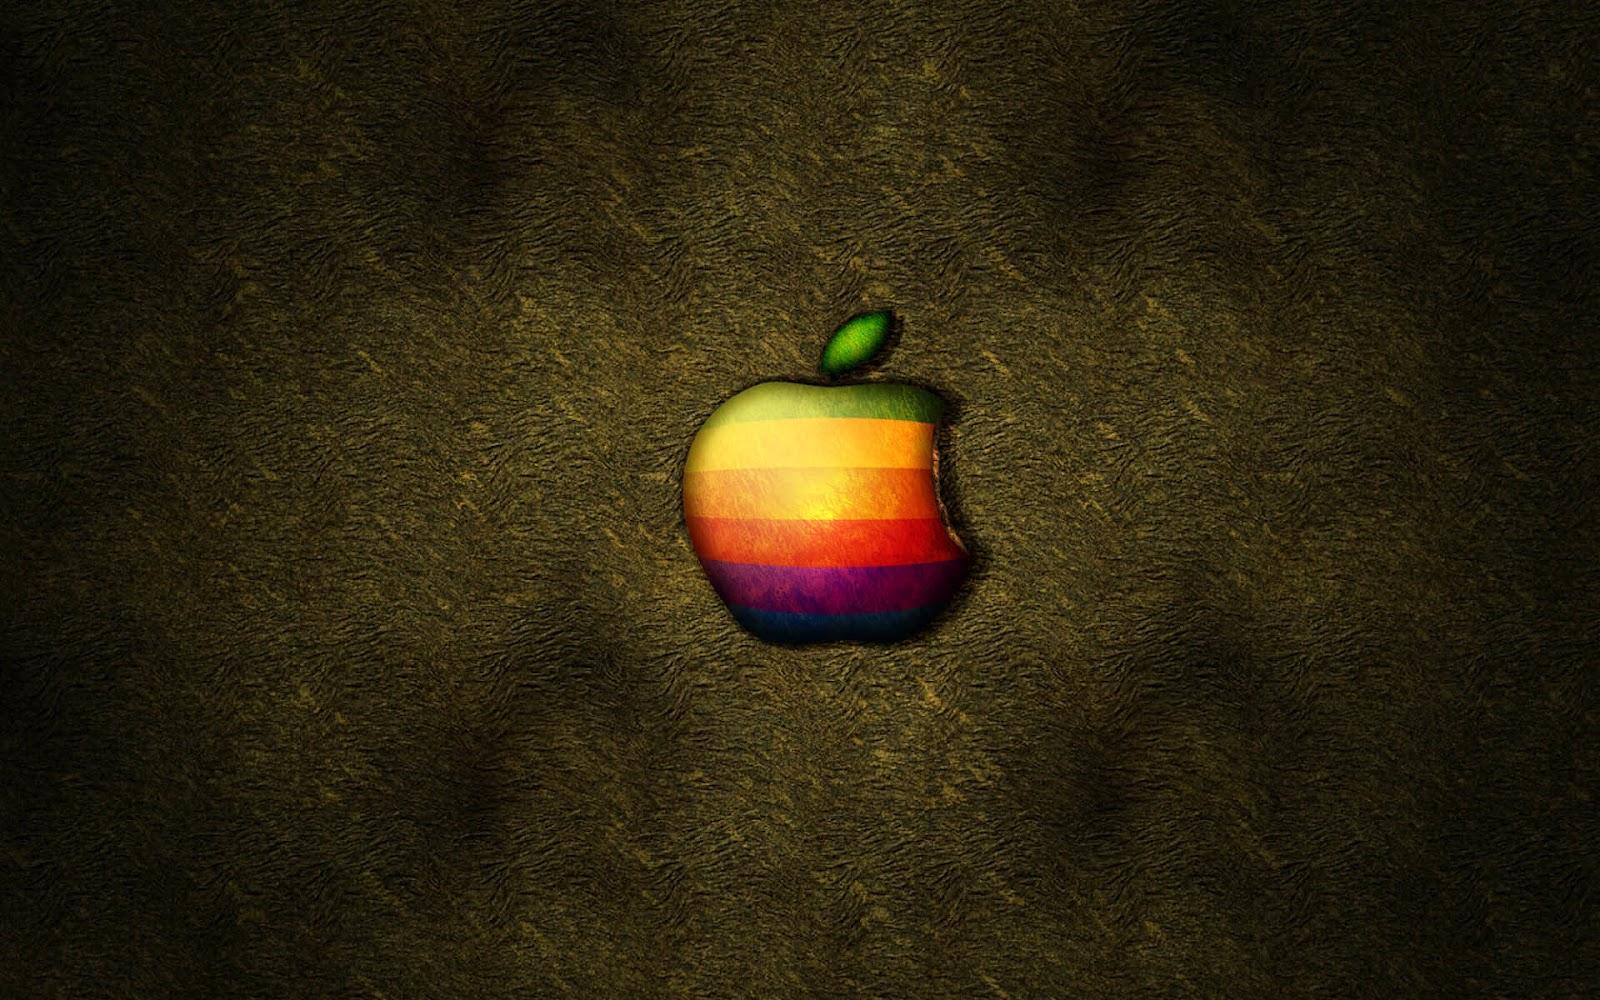 Simple Wallpaper Mac 1080p - REwQXe  Gallery_183168.jpg